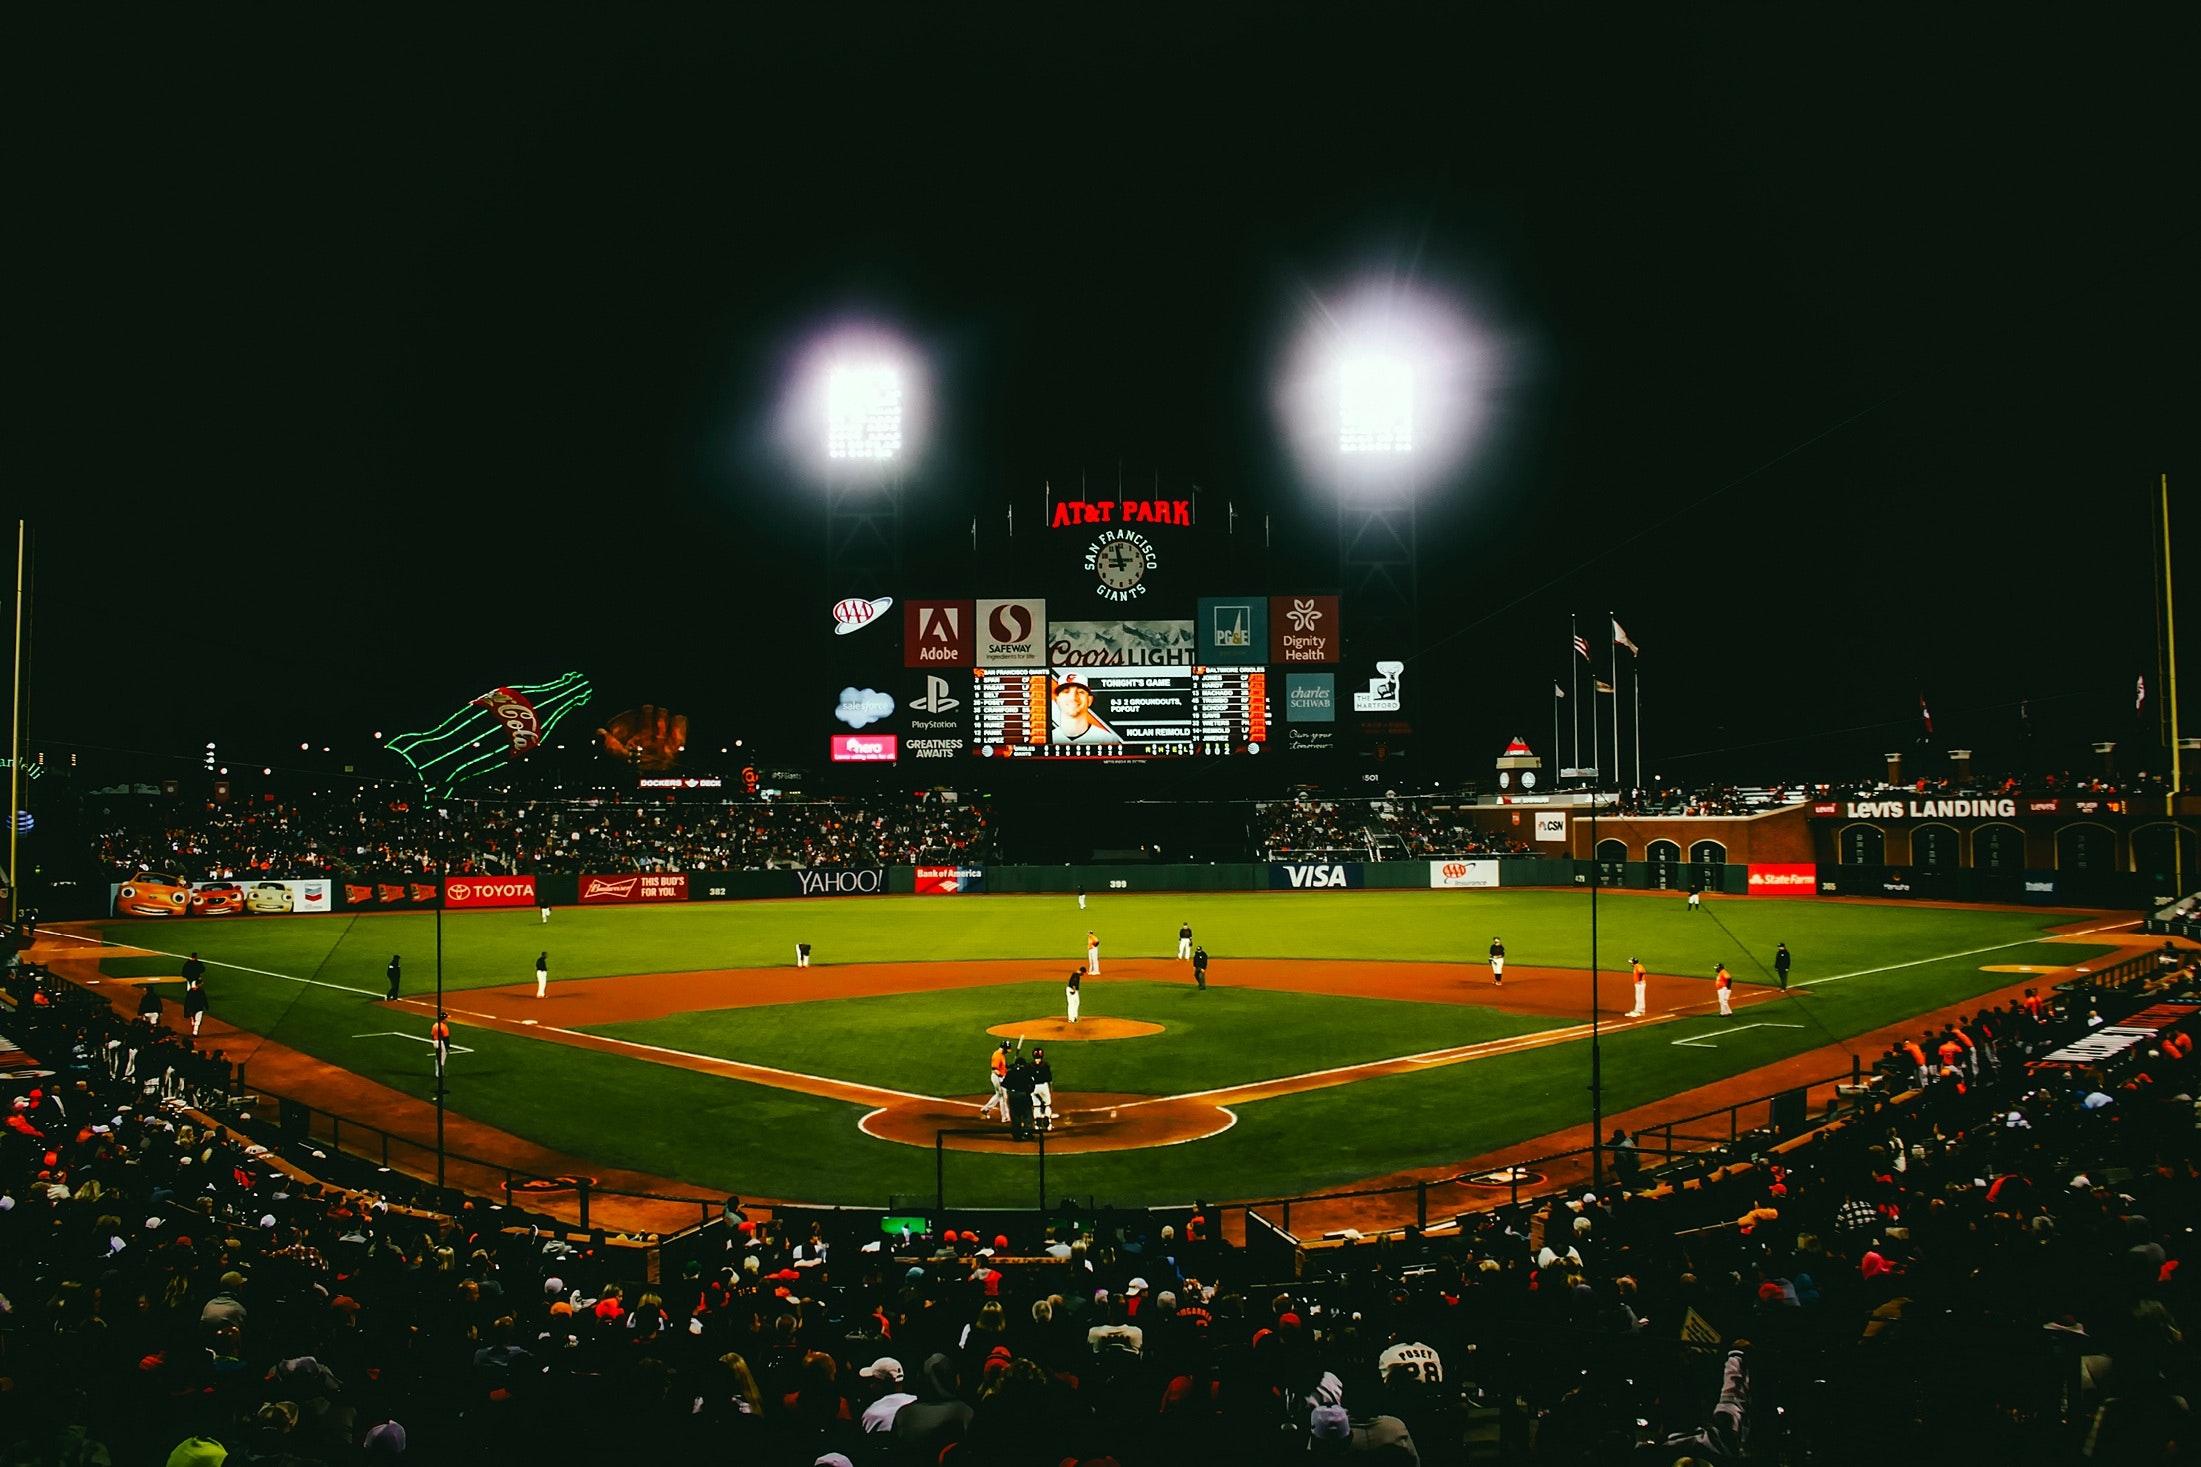 Foto stok gratis tentang atlet, bangku, baseball